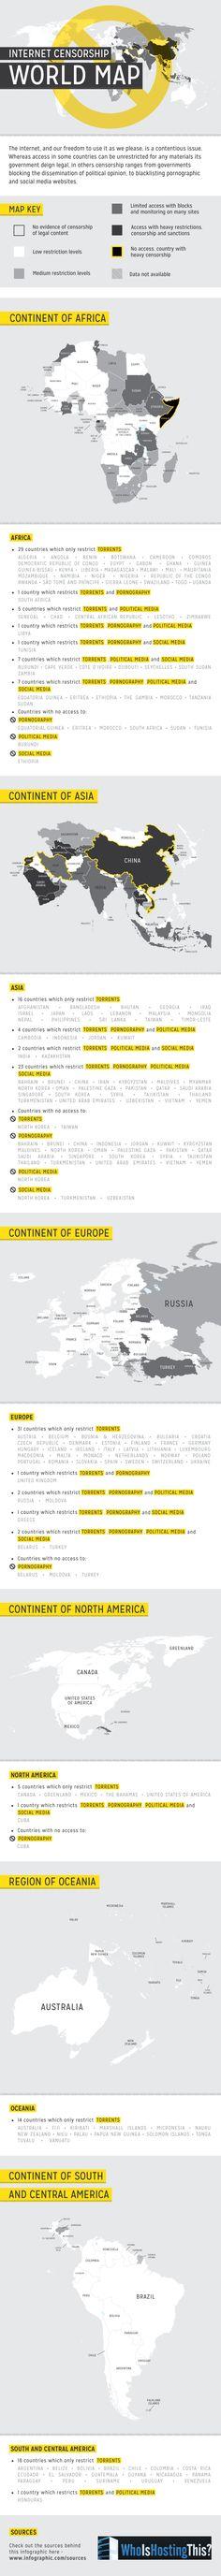 Httpworldmapharvardmaps121 worldmap is a more data heavy carte mondiale de la censure sur internet internet censorship world map gumiabroncs Choice Image